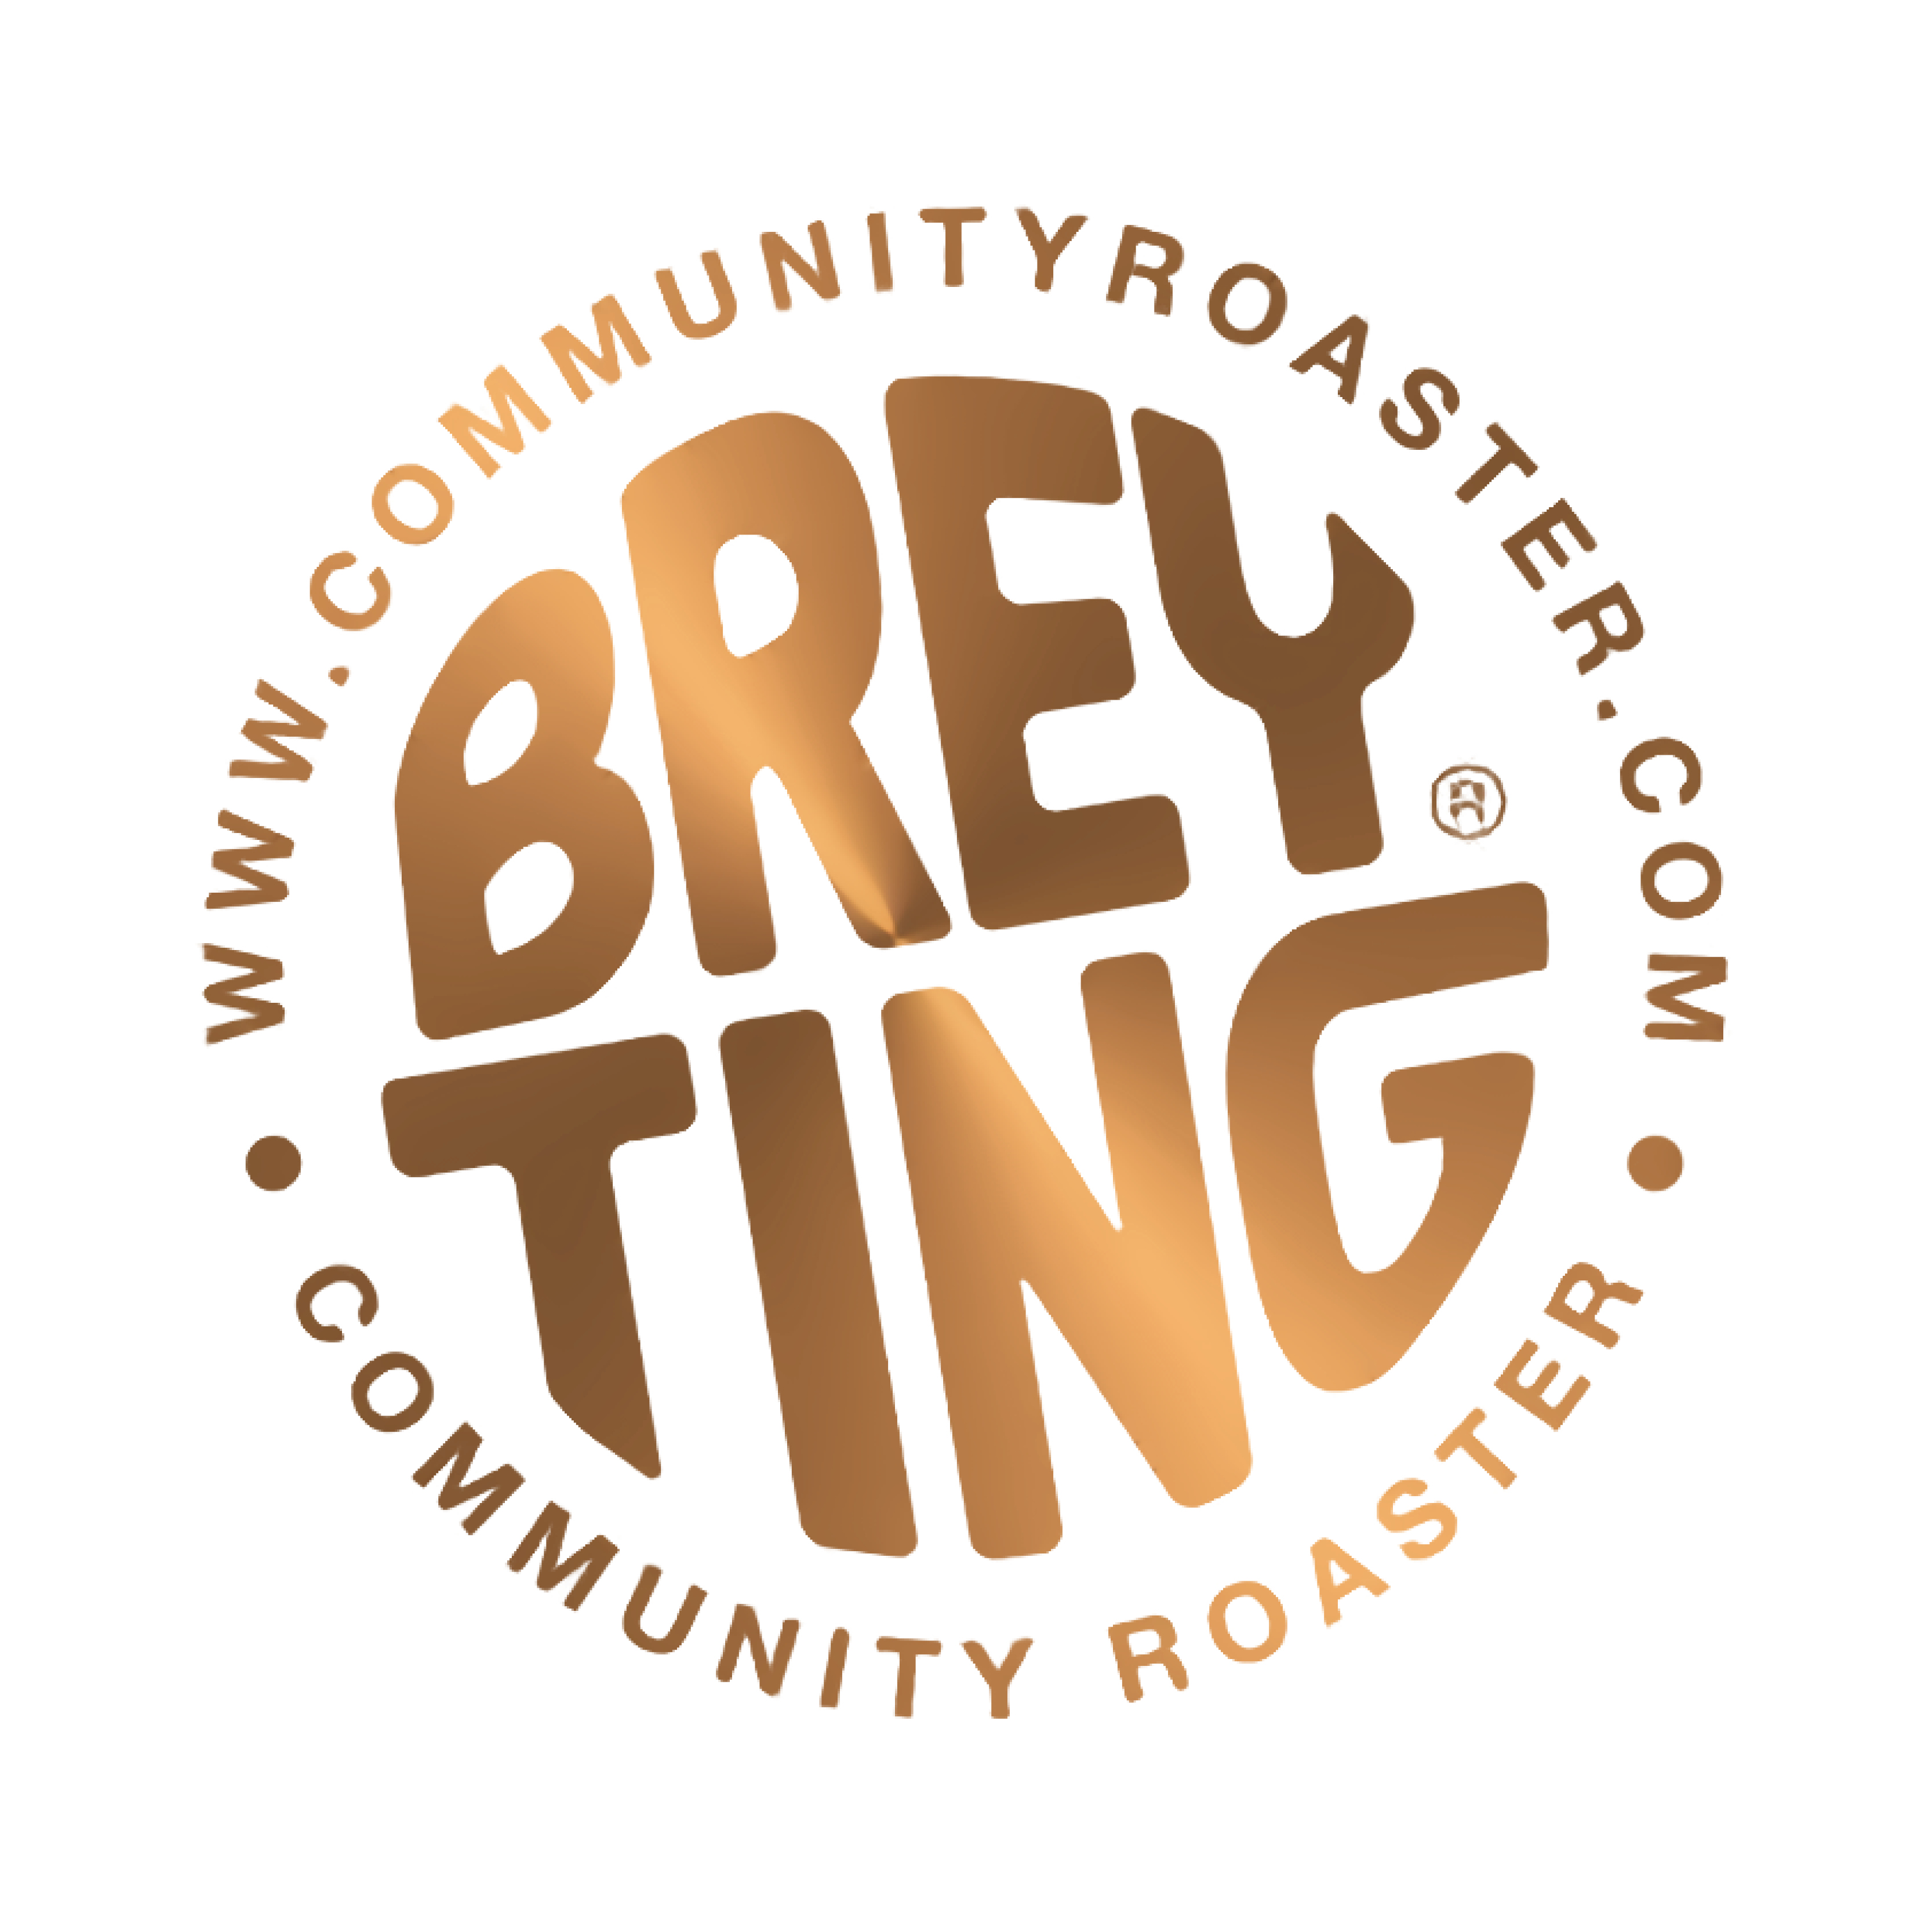 Breyting Community Roaster